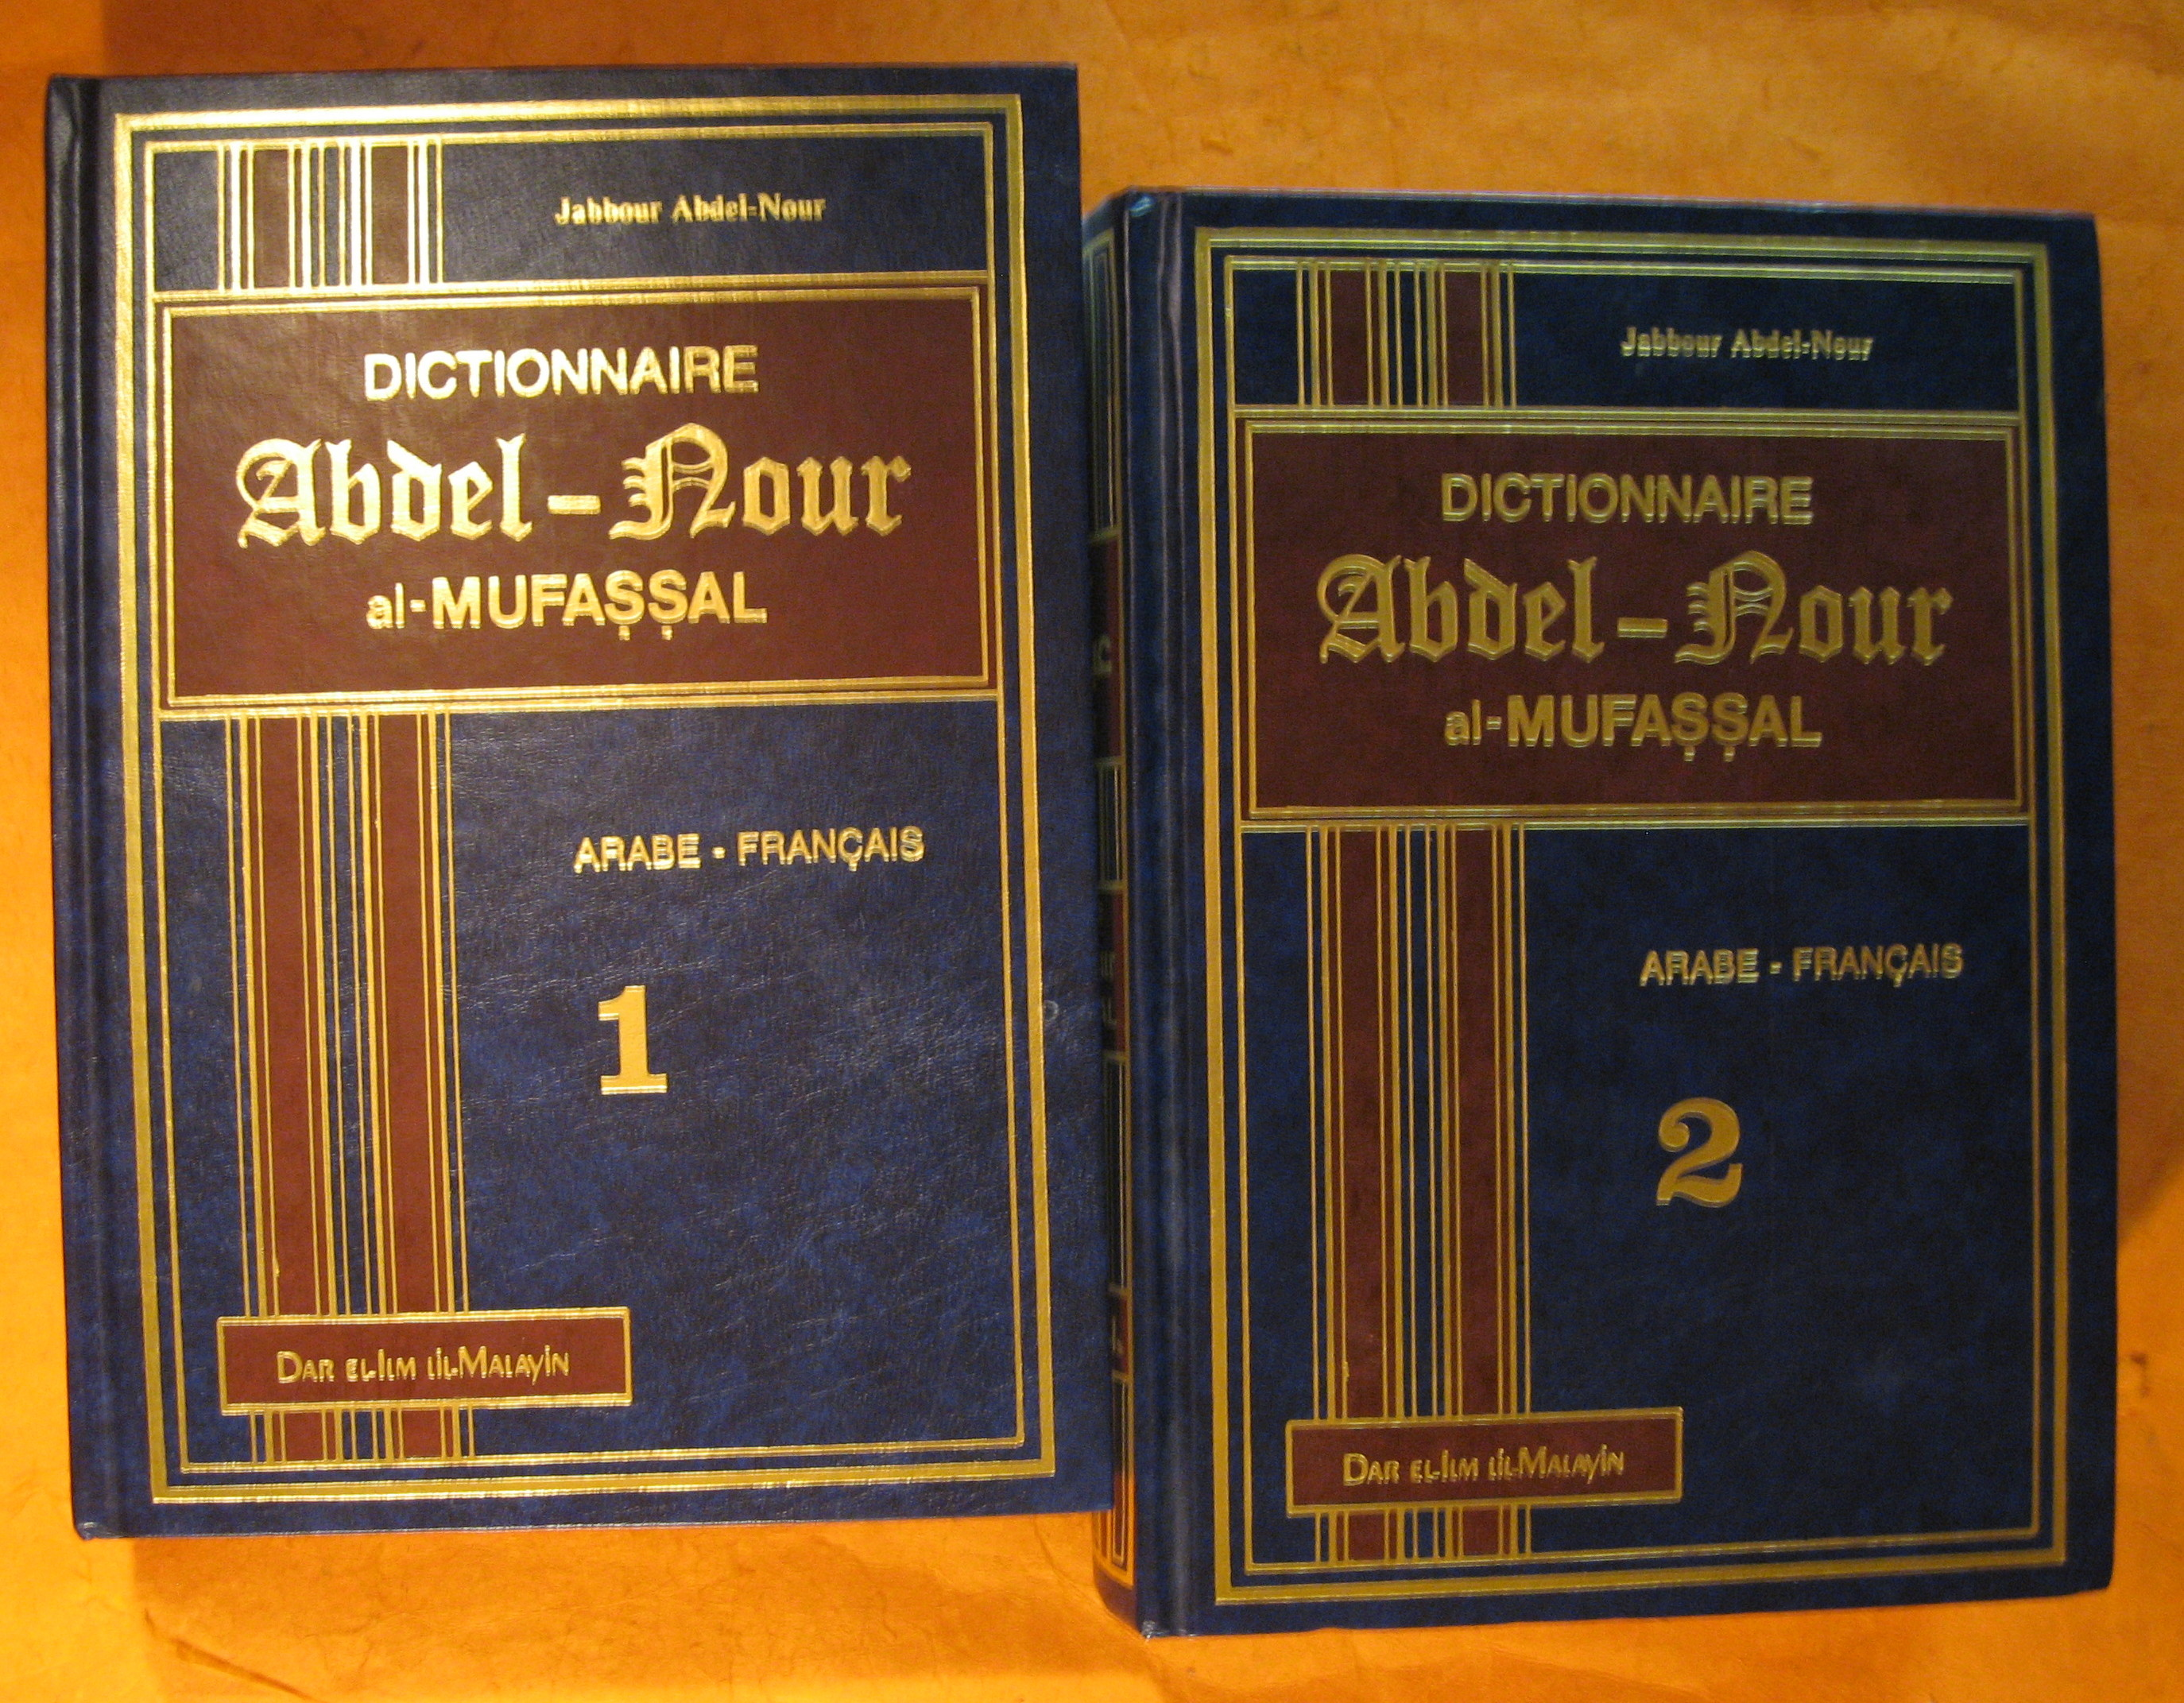 dictionnaire abdel - nour al-mufassal   arabe